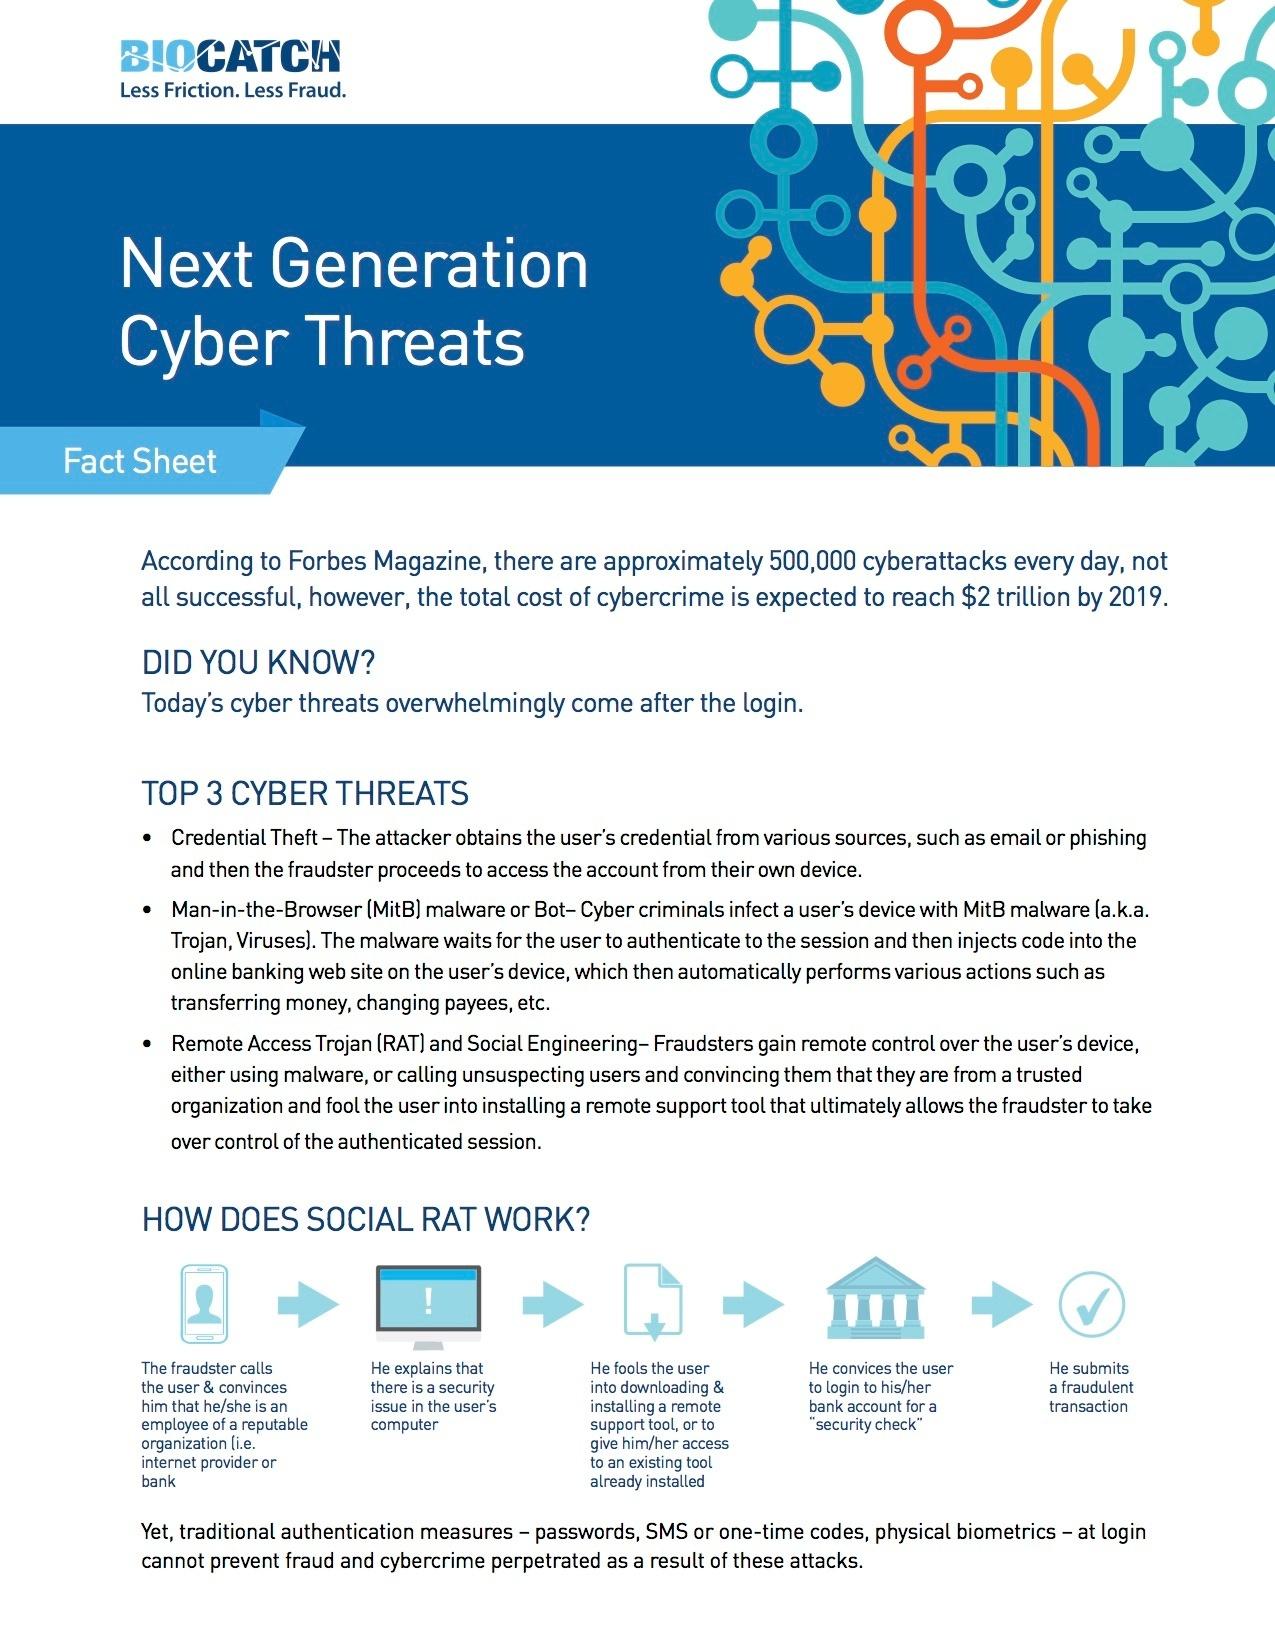 (18) BioCatch Next Generation Cyber Threats Brochure.jpg